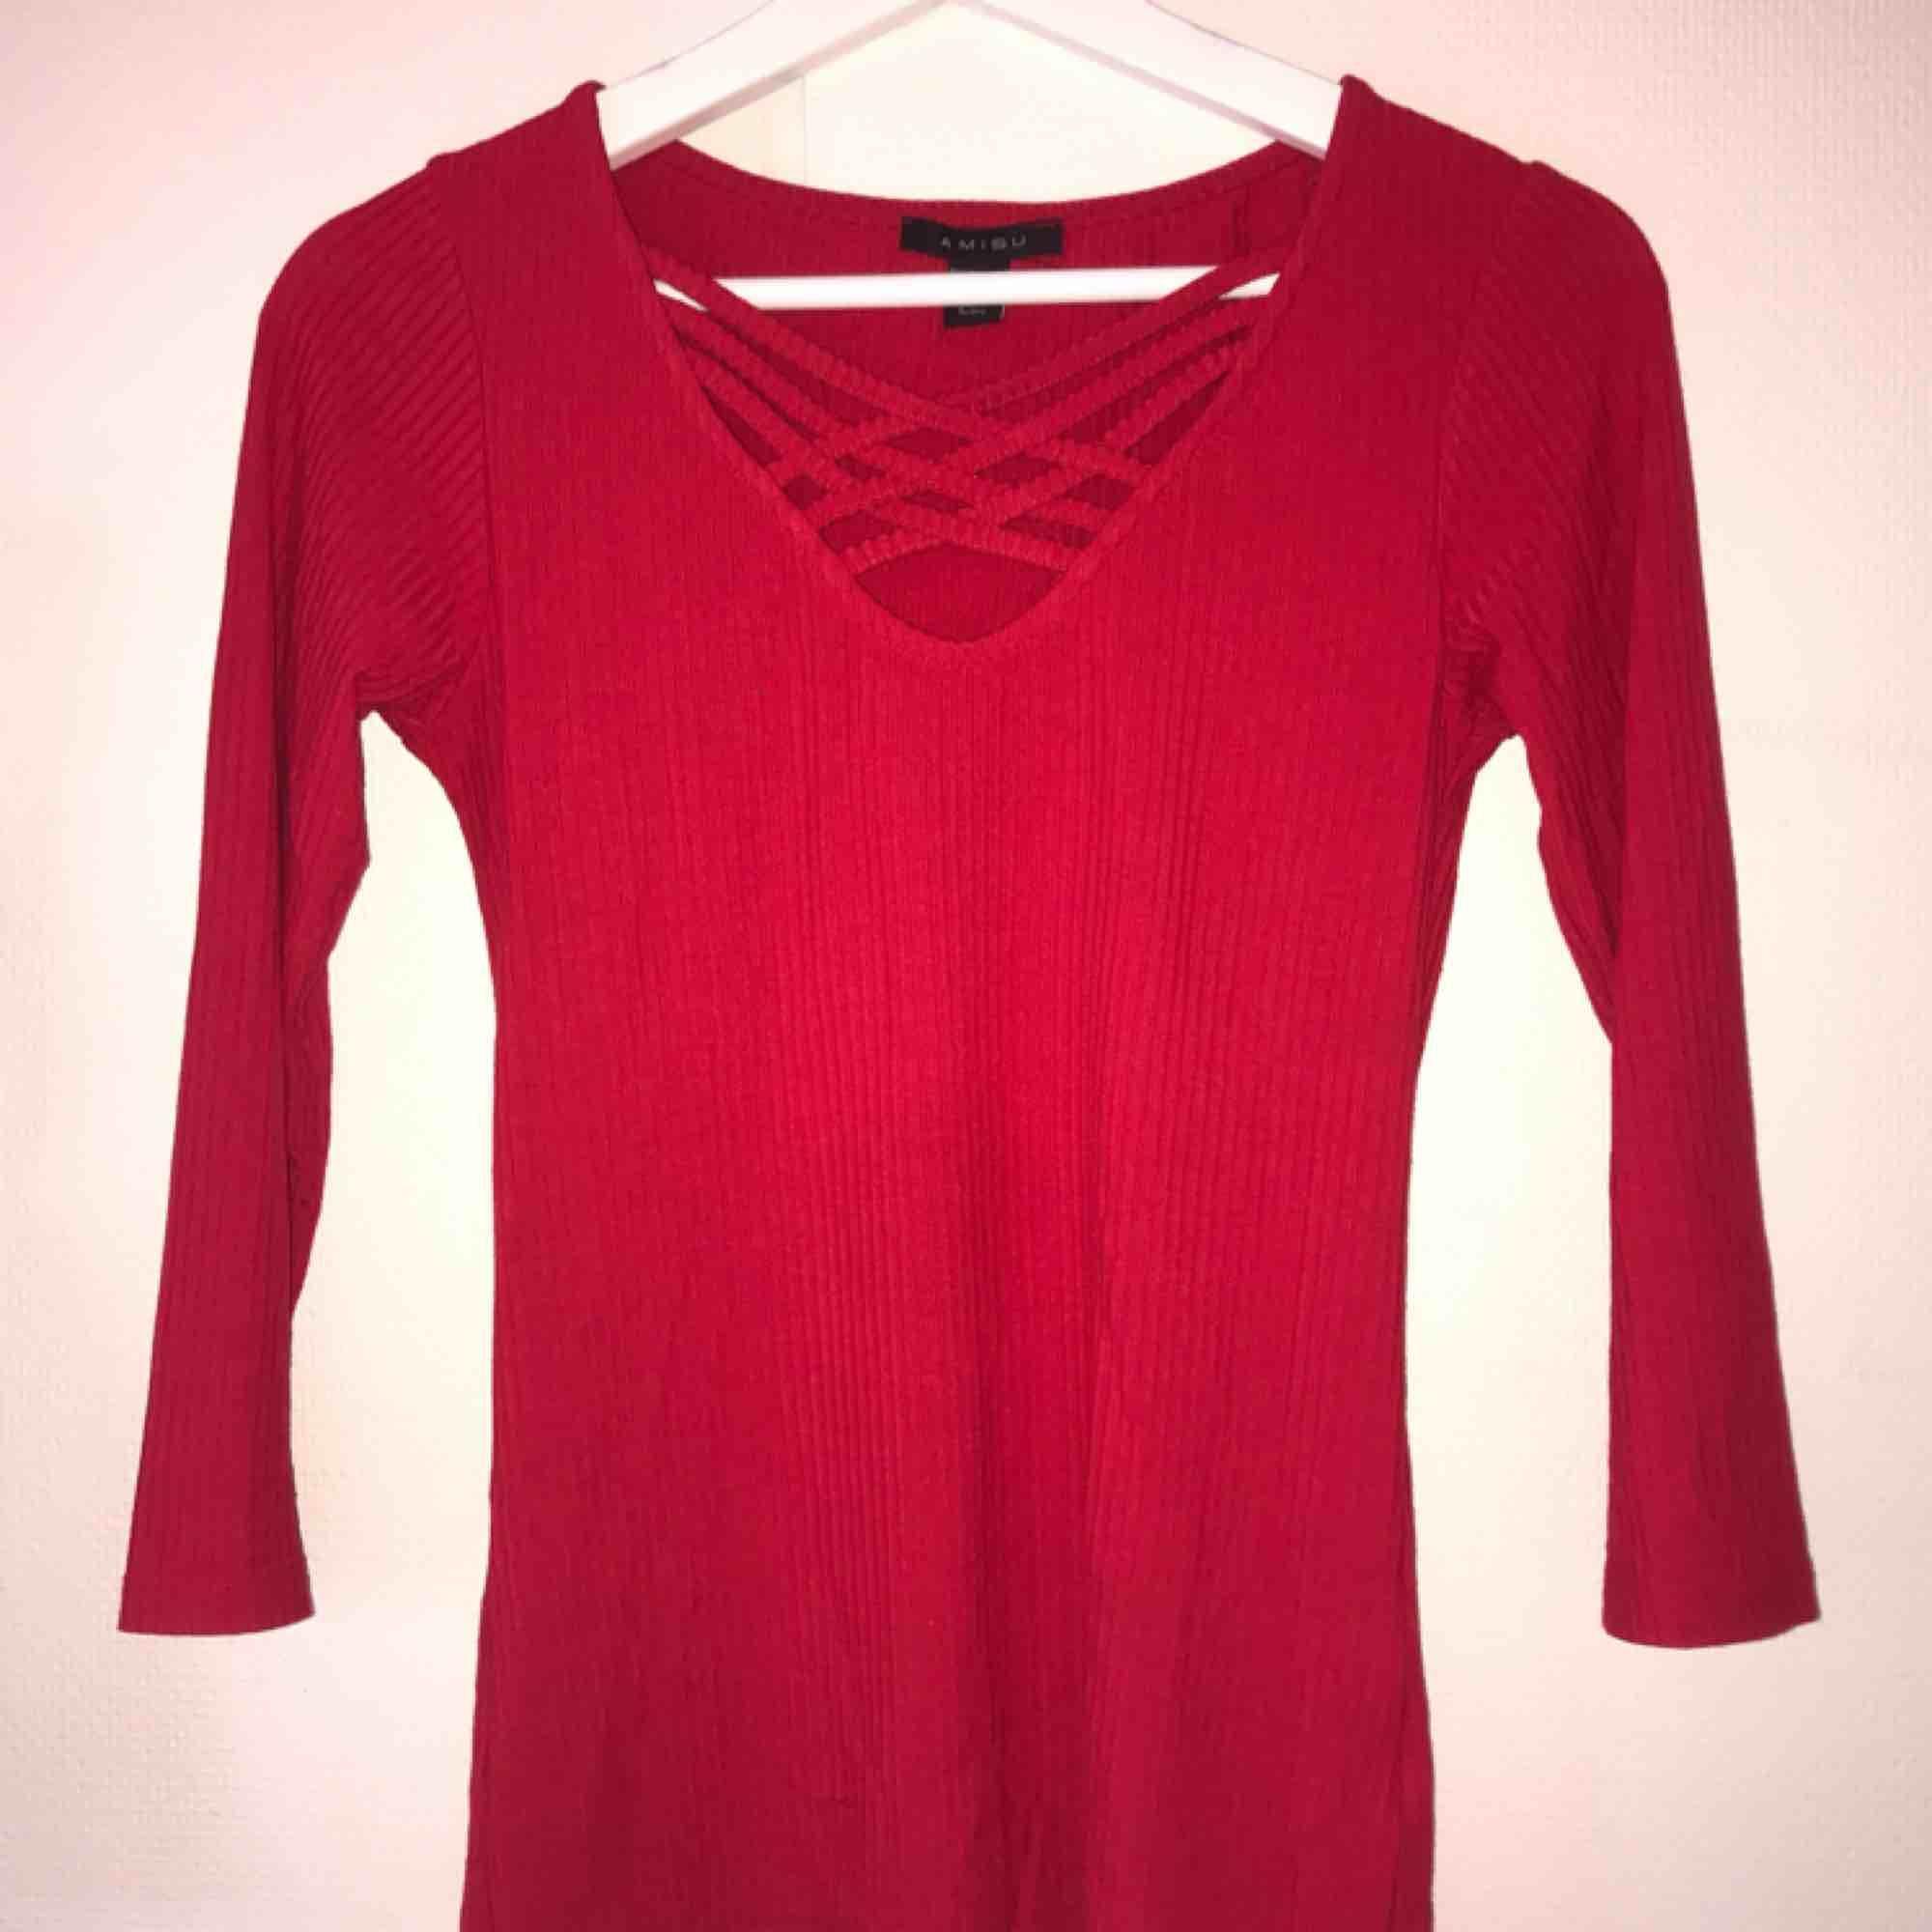 Superfin tröja i skönt material. Endast provad, strl XS😊 . Tröjor & Koftor.